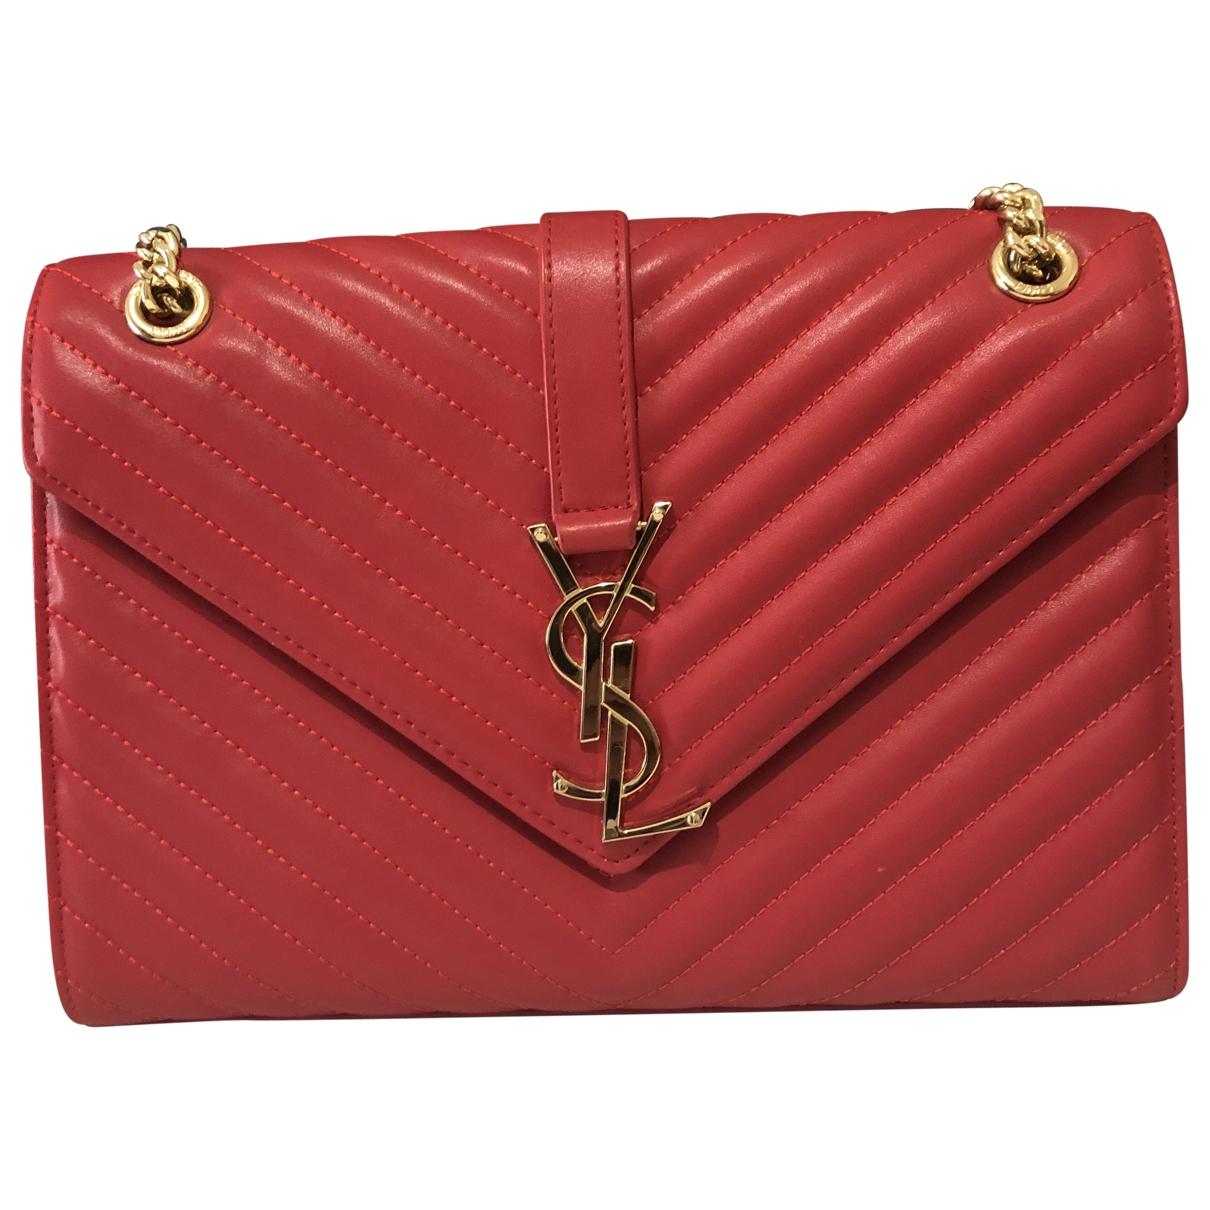 Saint Laurent Satchel monogramme Red Leather handbag for Women \N